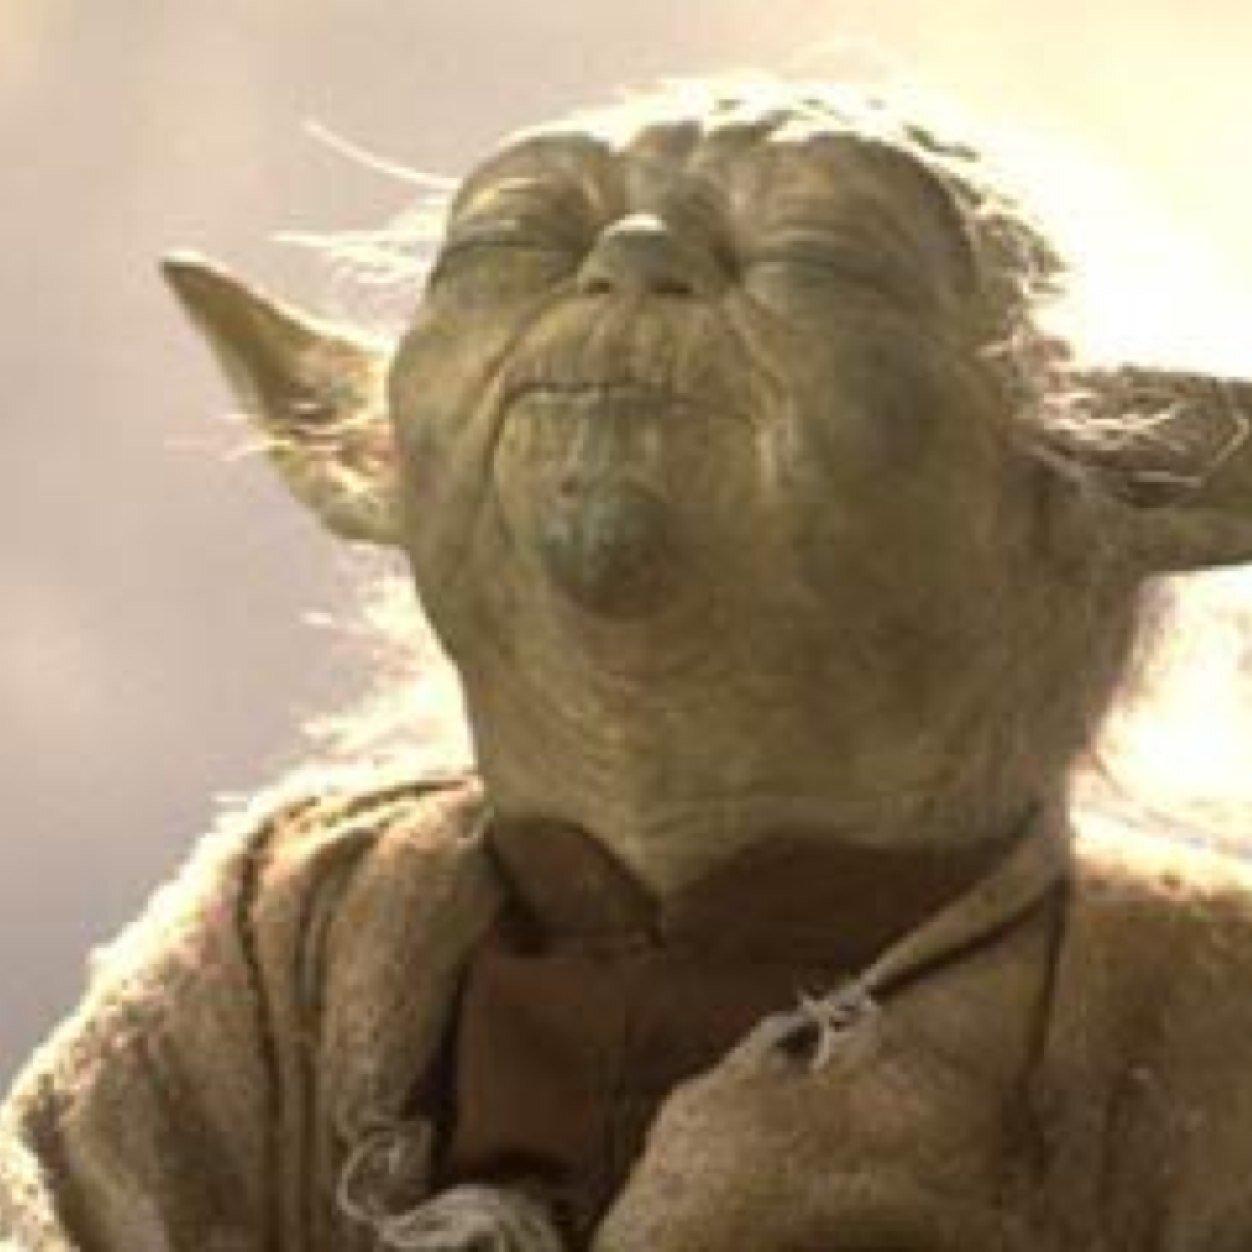 Yoga Yoda On Twitter At Butterxiaojw Whole Body Aching After Yoda